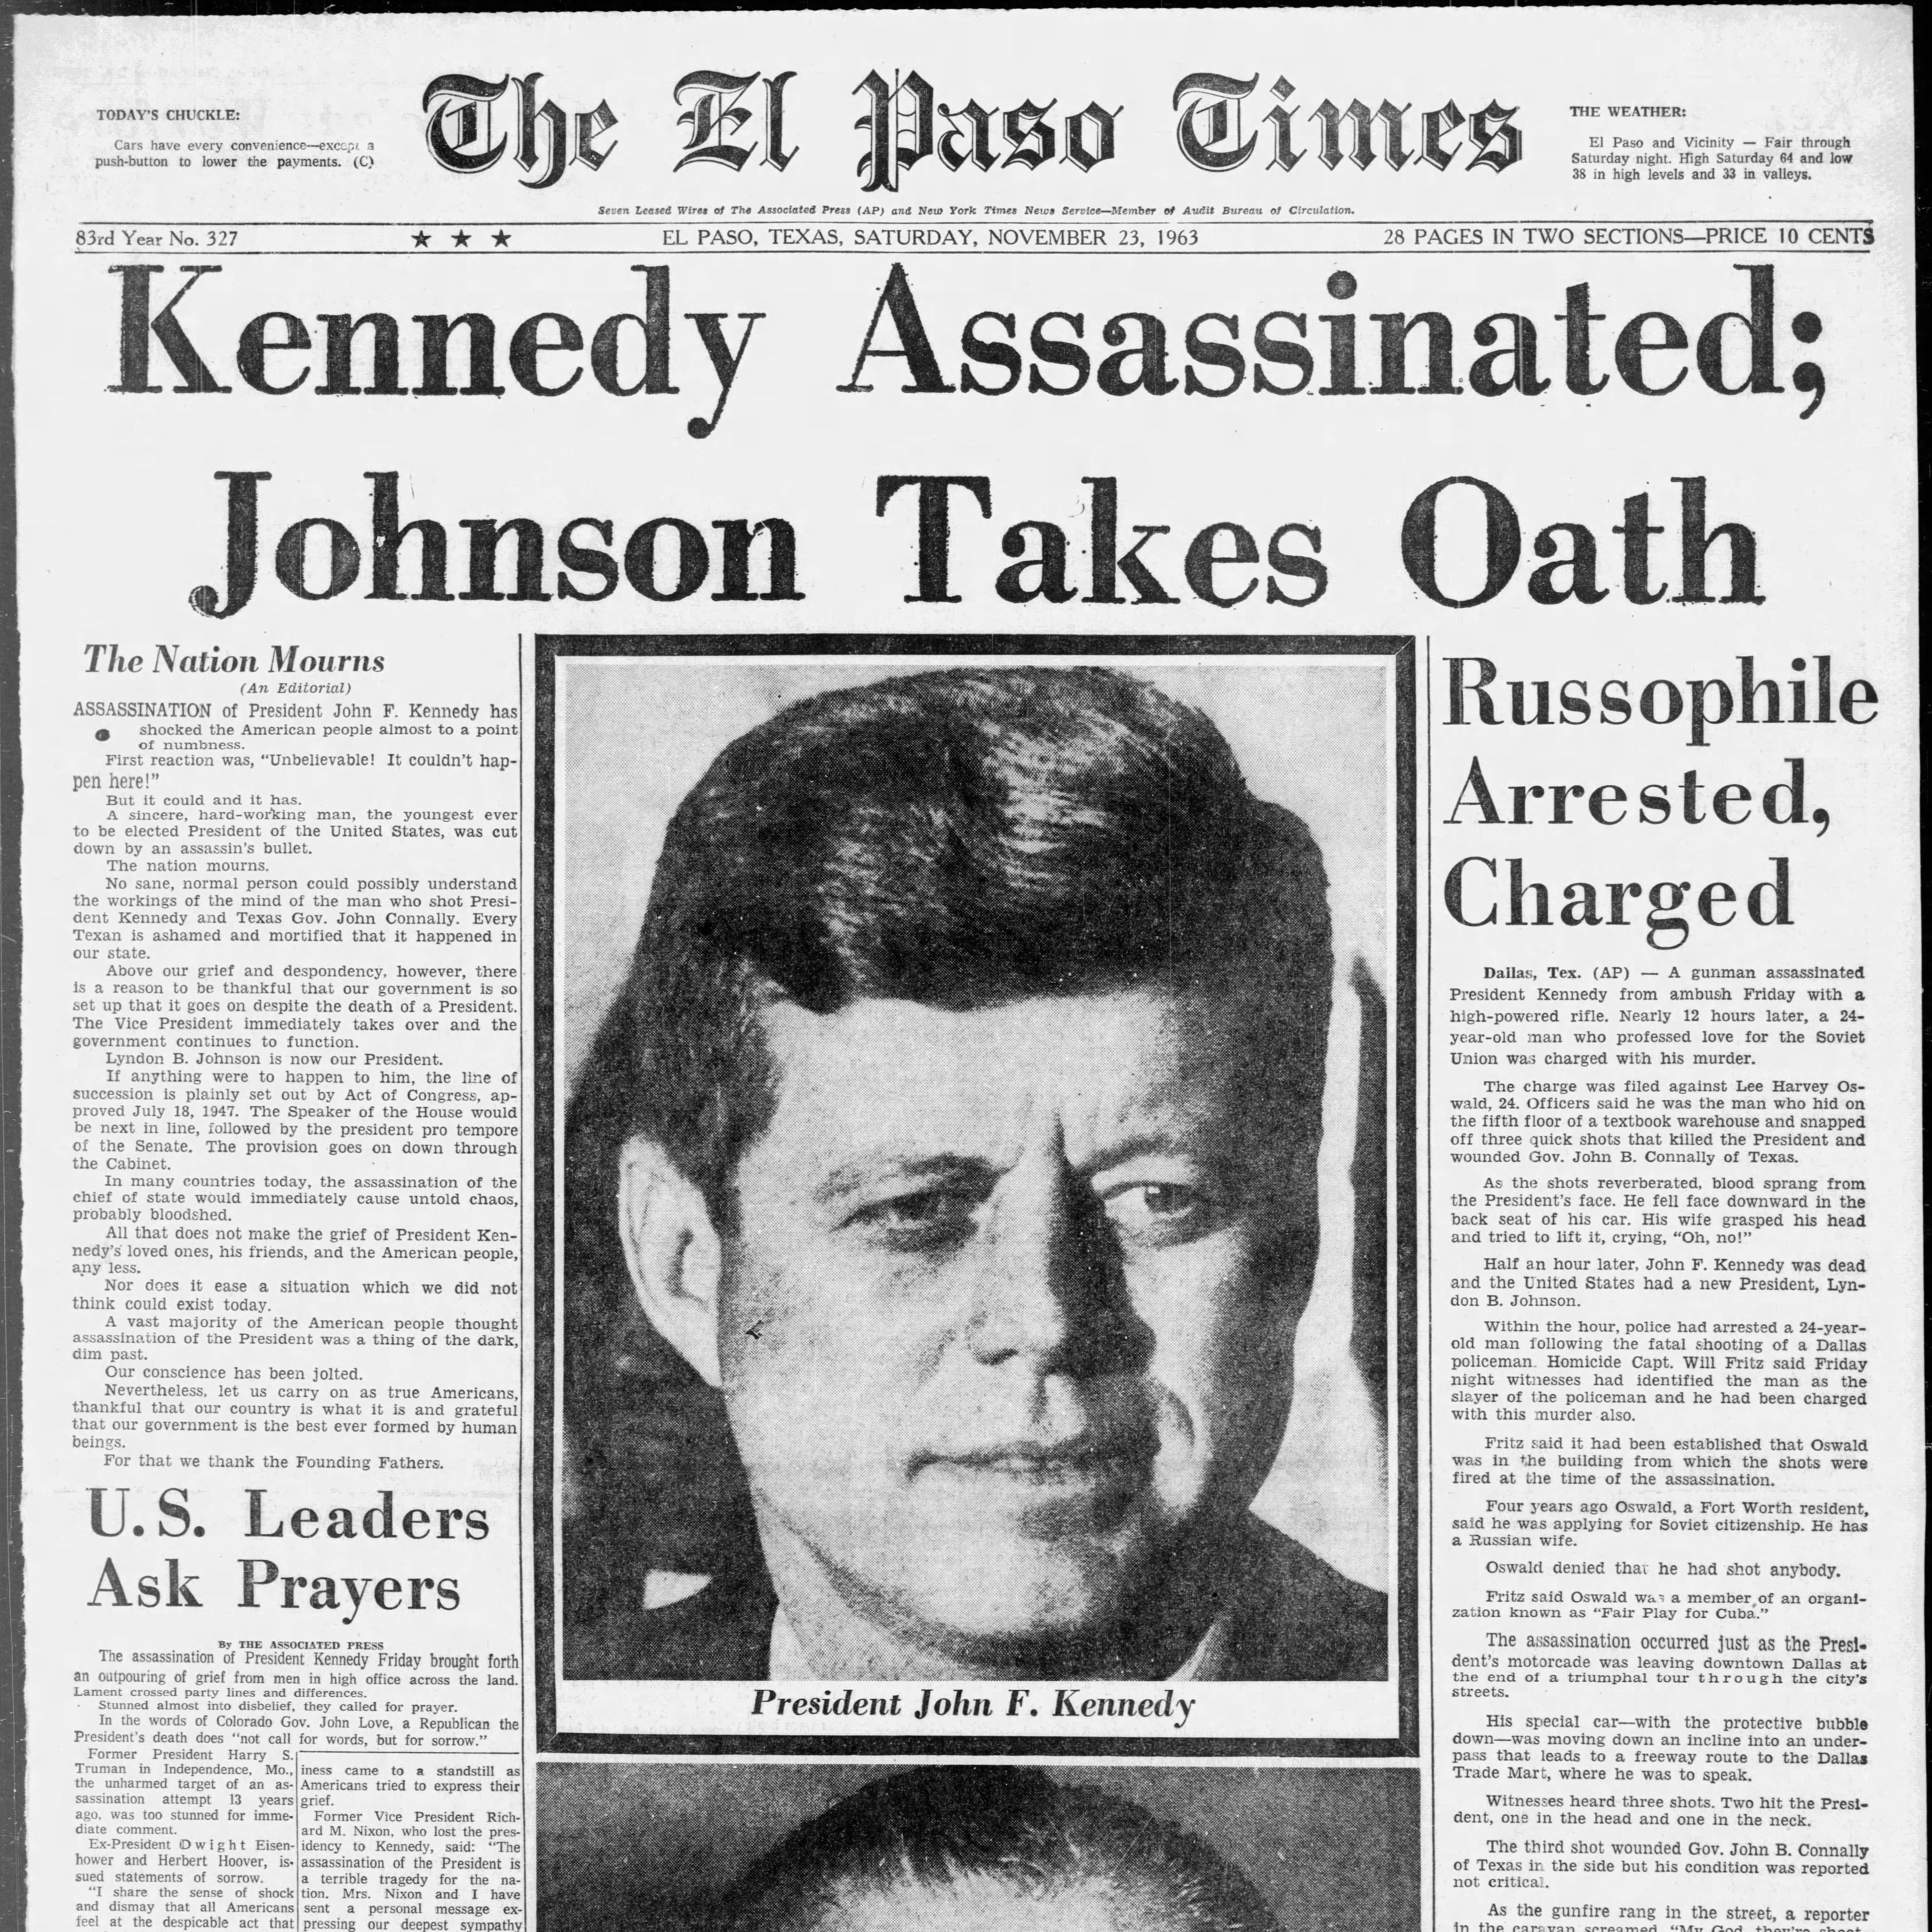 President Kennedy assassination stunned El Pasoans, closed border